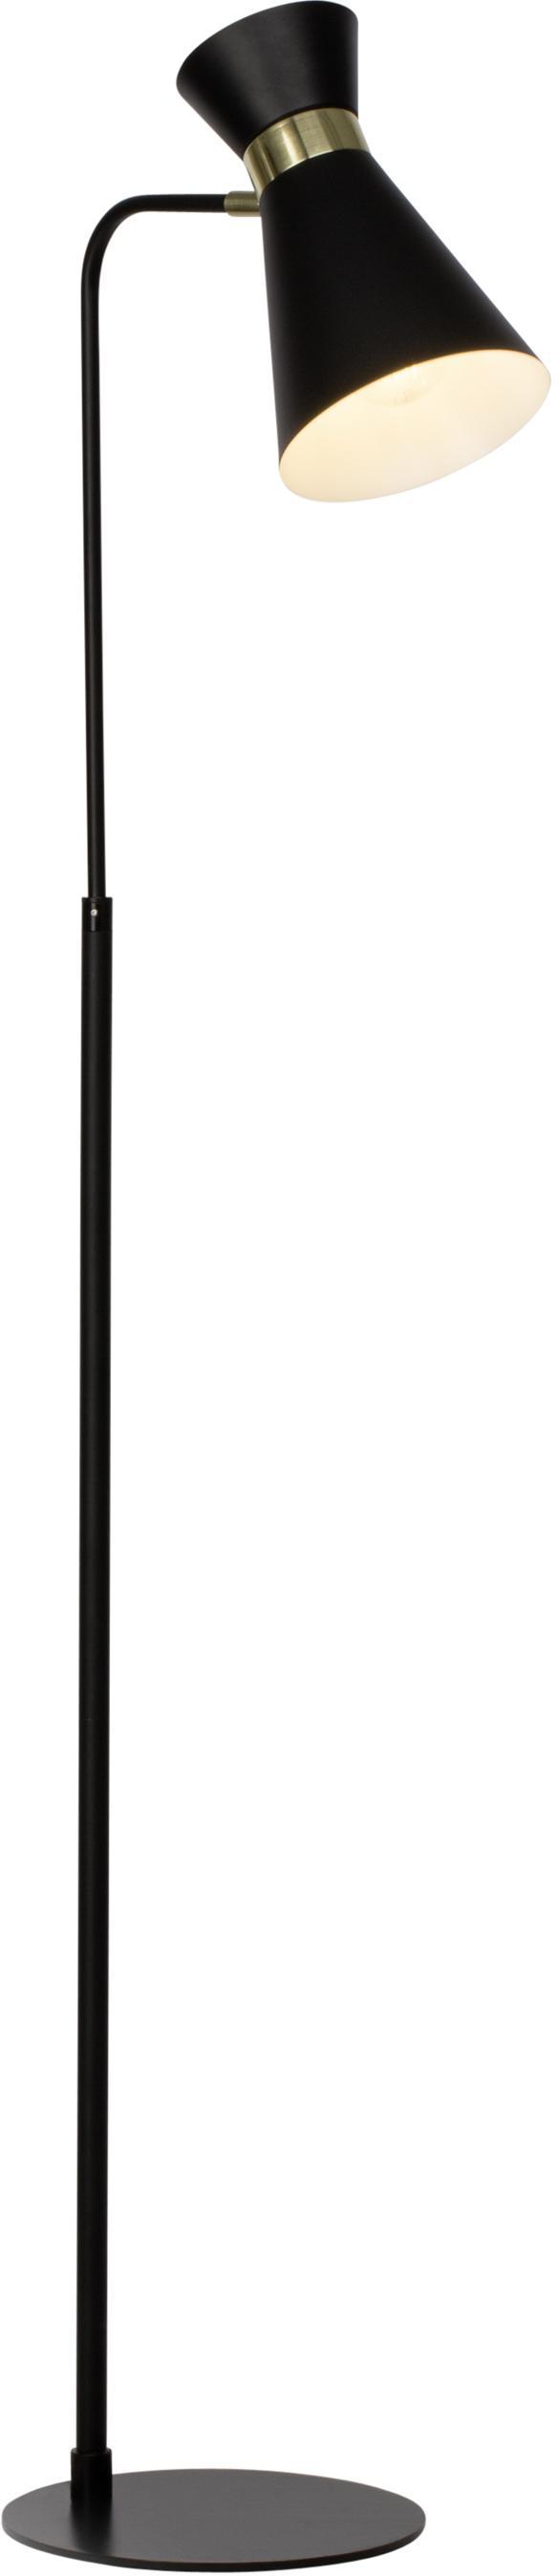 Leselampe Grazia, verstellbar, Metall, lackiert, Lampenfuss und Lampenschirm: Schwarz<br>Befestigung: Goldfarben, matt, 39 x 144 cm